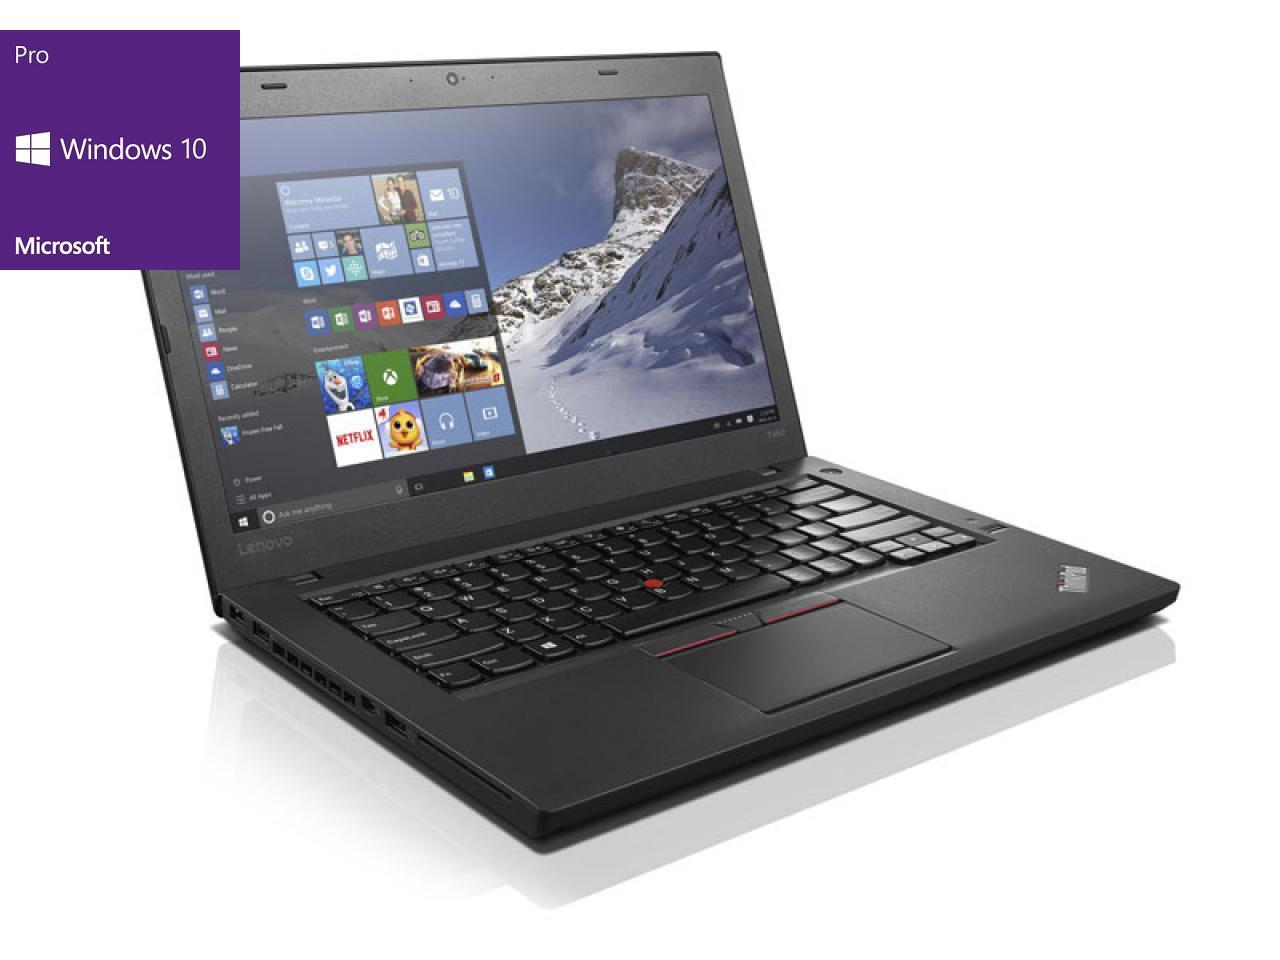 Lenovo ThinkPad T460  - shop.bb-net.de